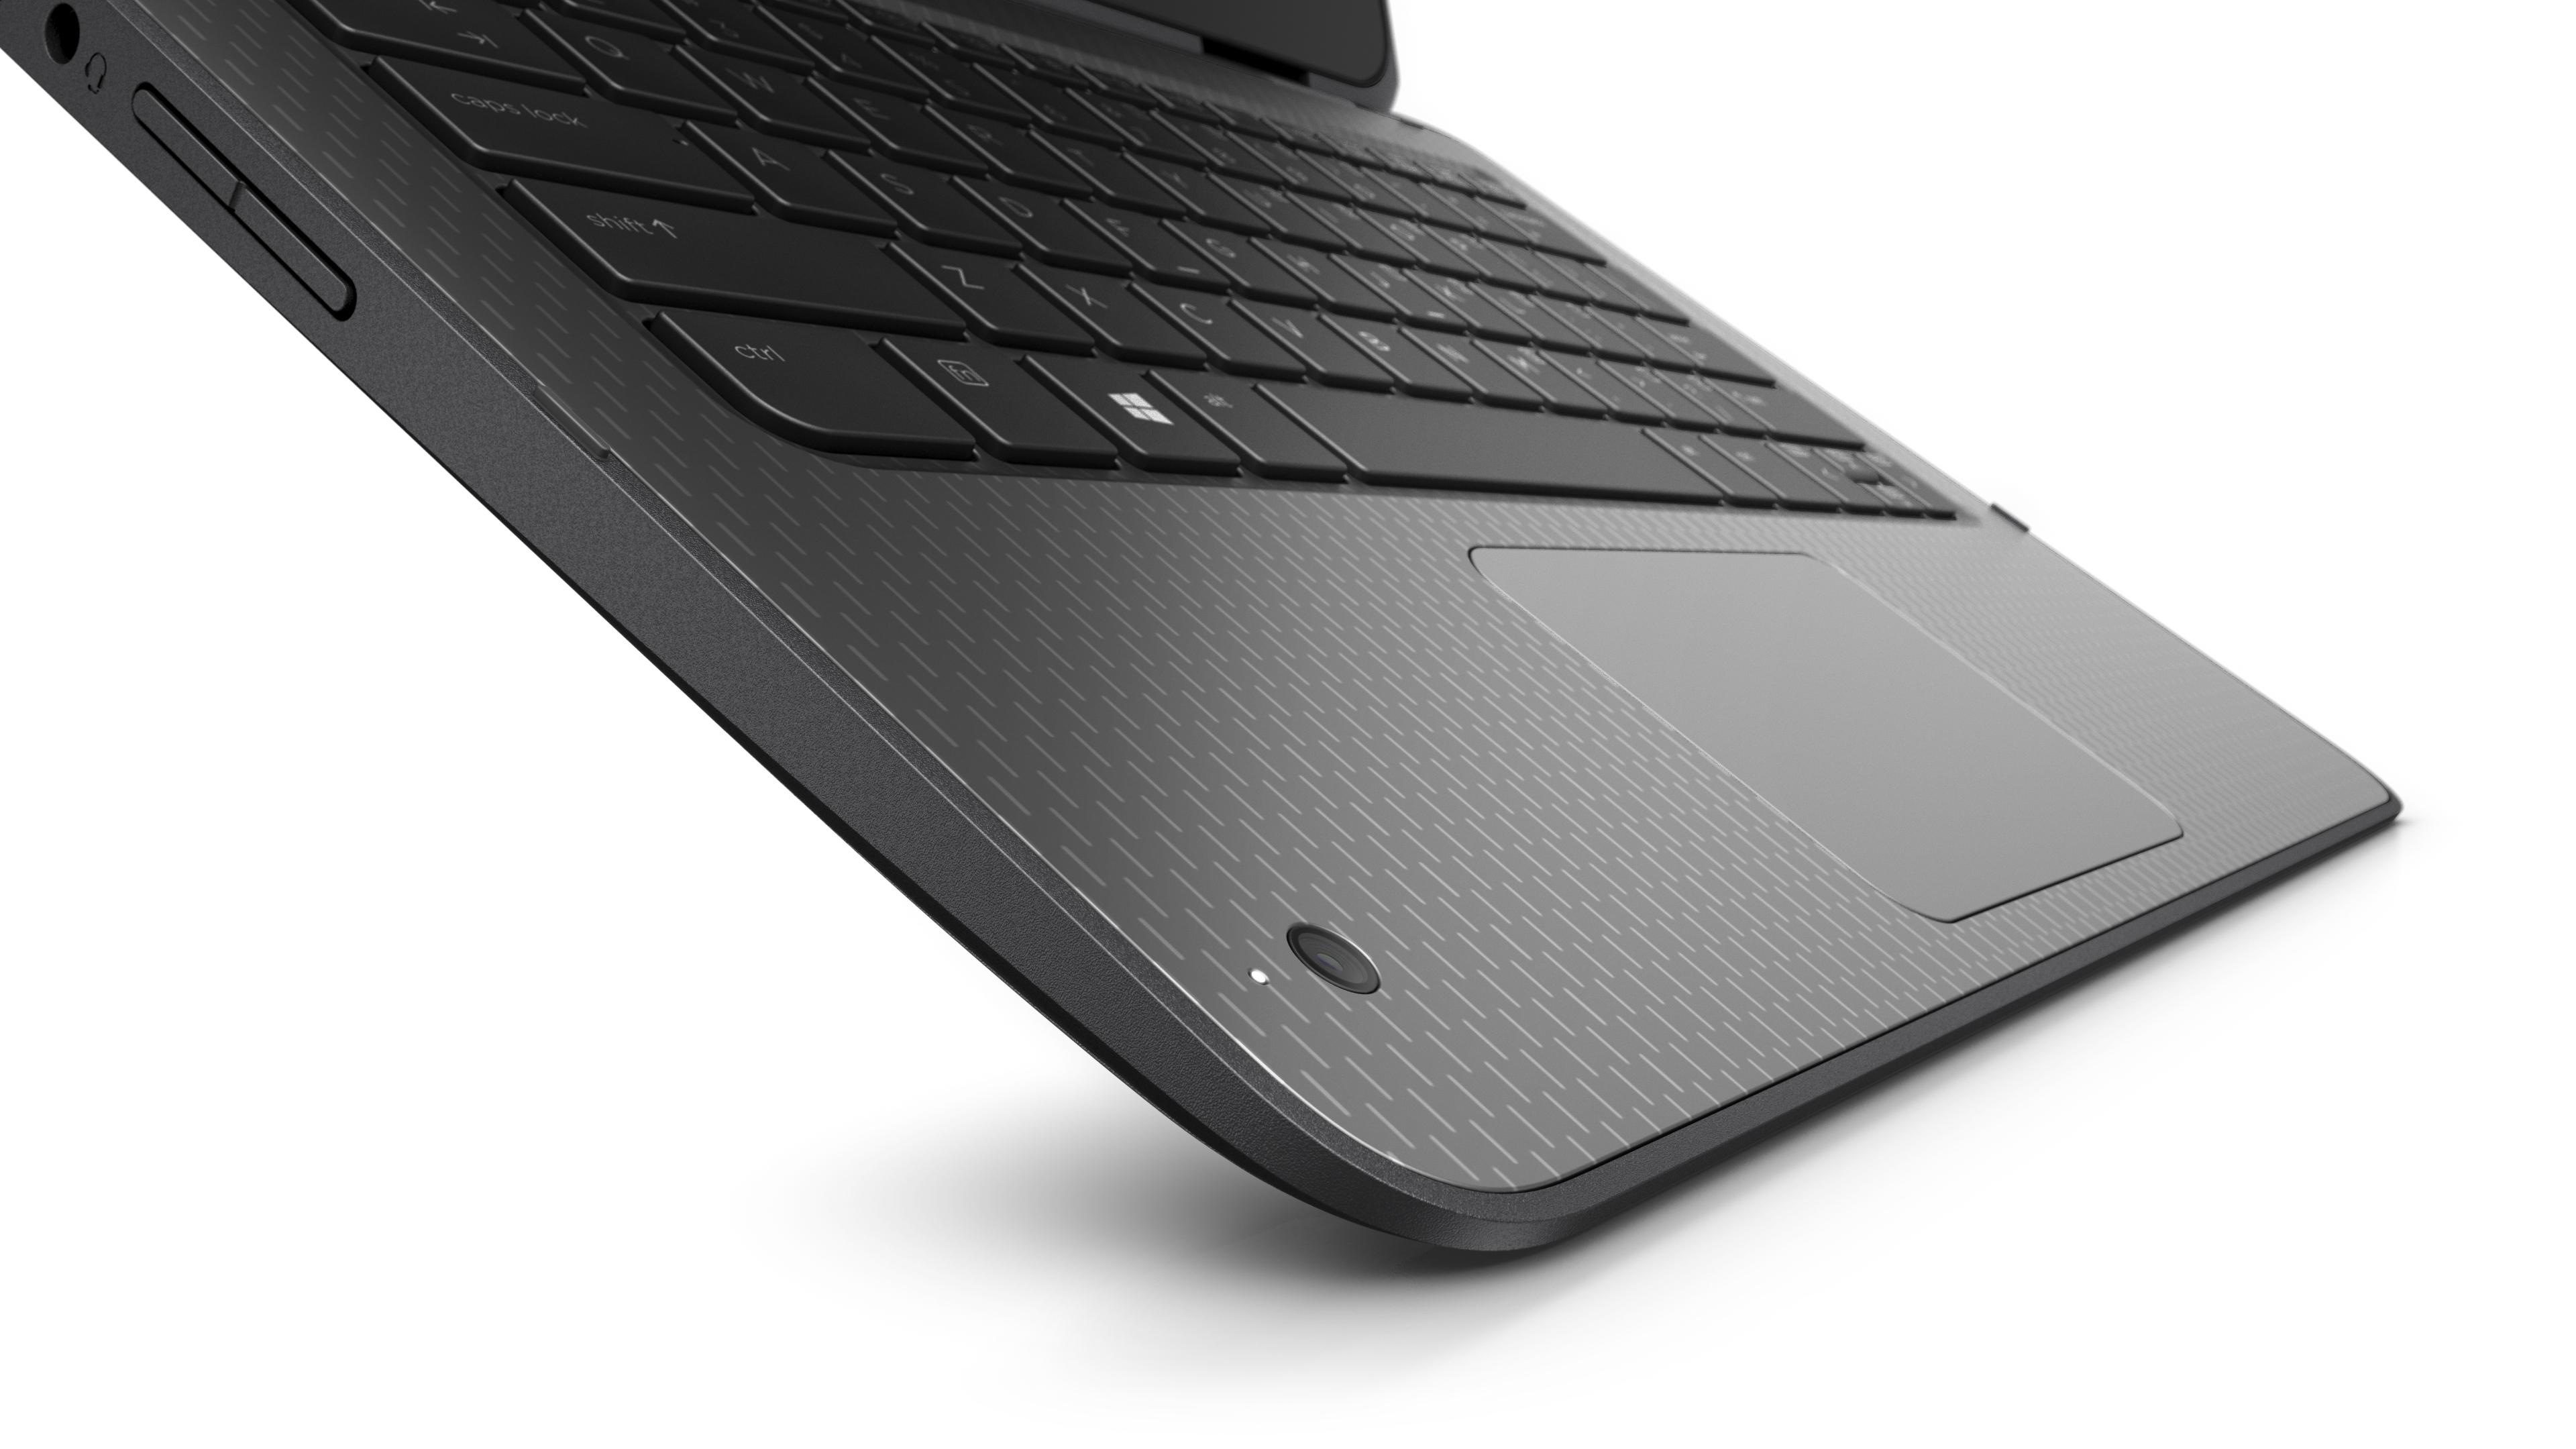 HP Tough ProBook Brings Hybrid Windows 10 Laptop-Tablet To The